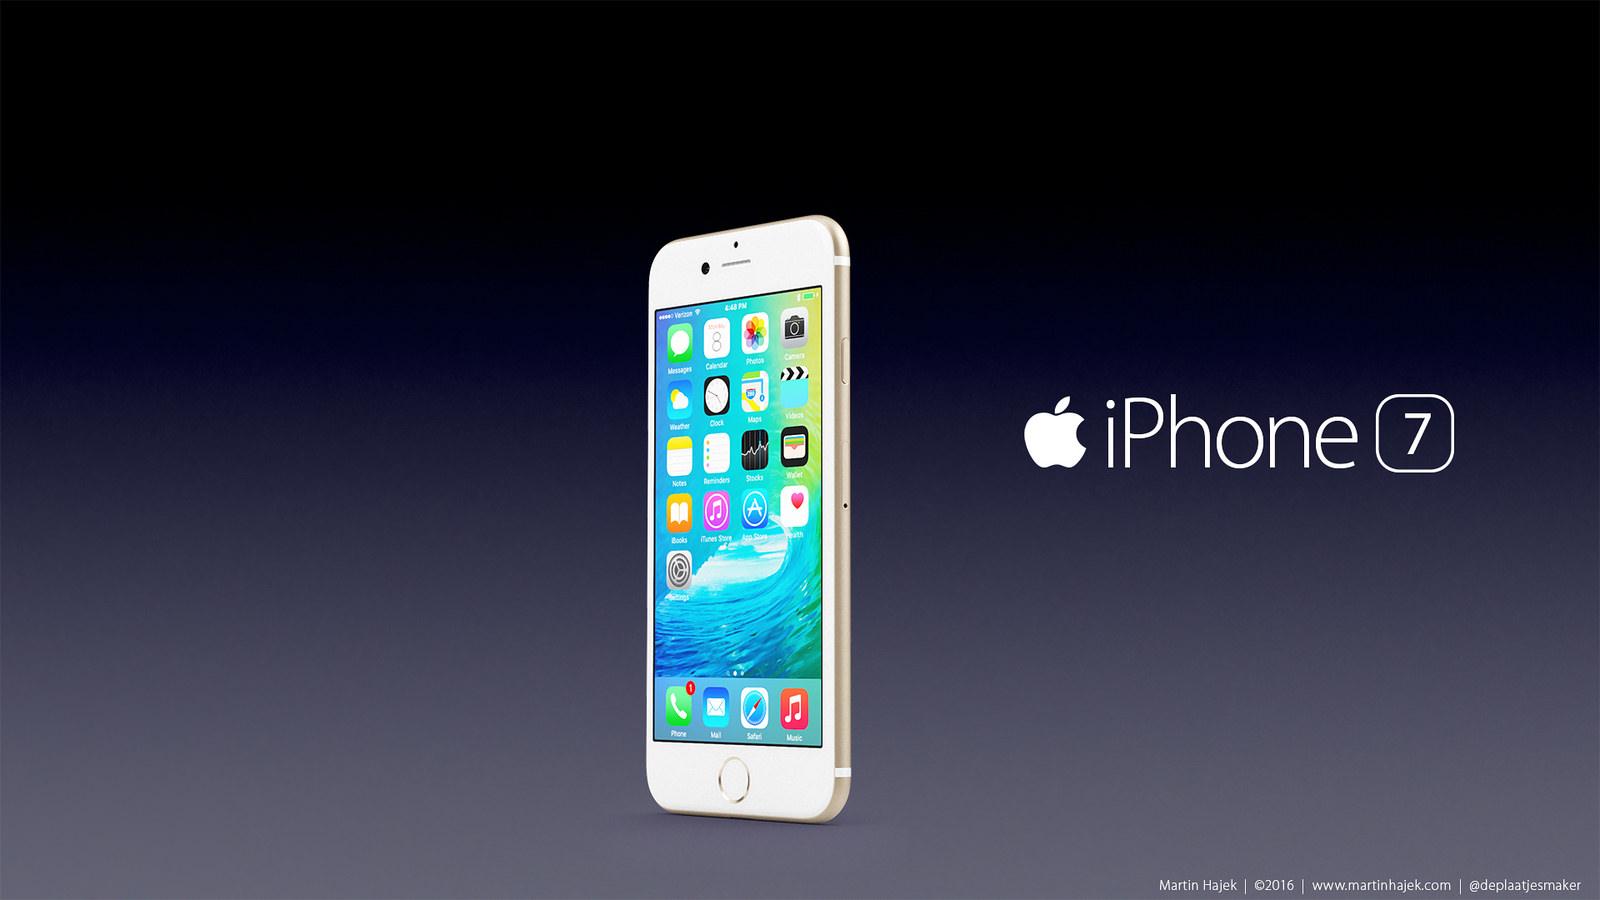 iPhone-7-Martin-Hajek-01